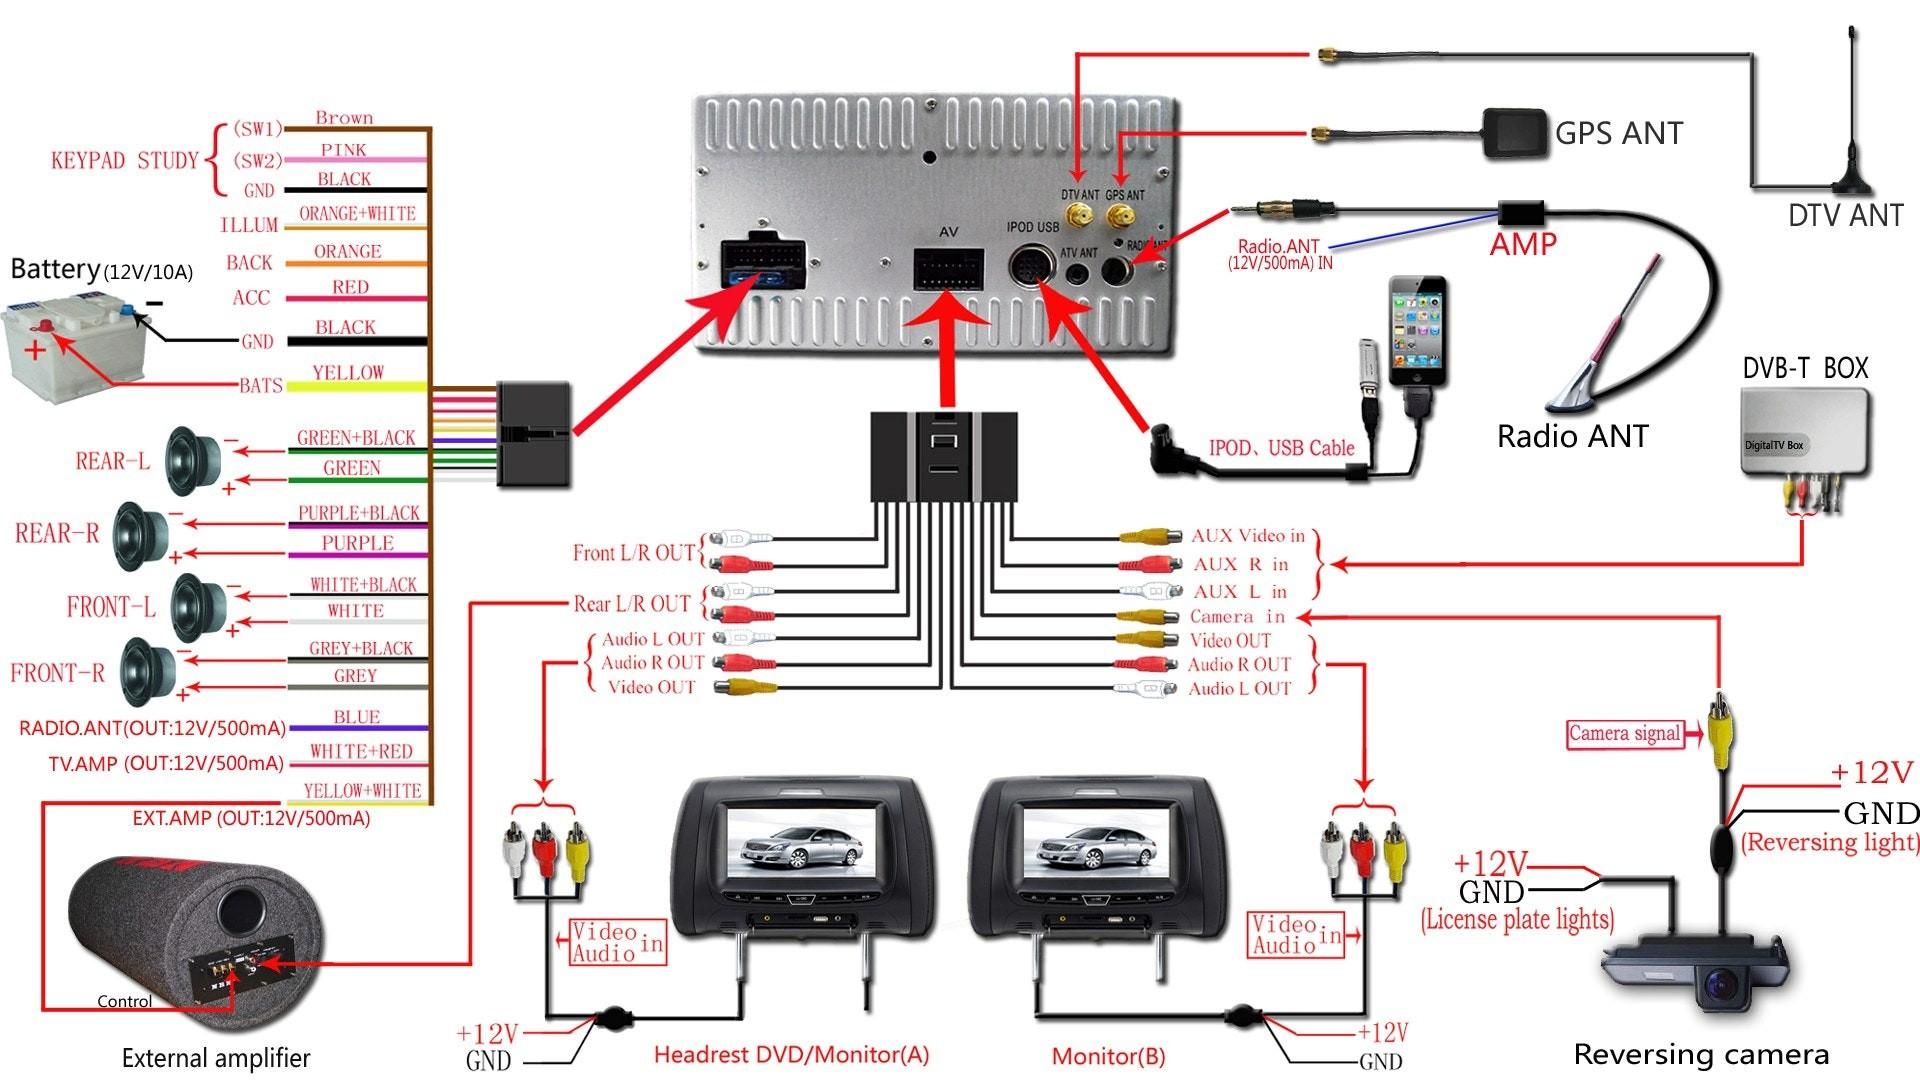 alpine car stereo wiring diagram 05 pontiac g6 for my